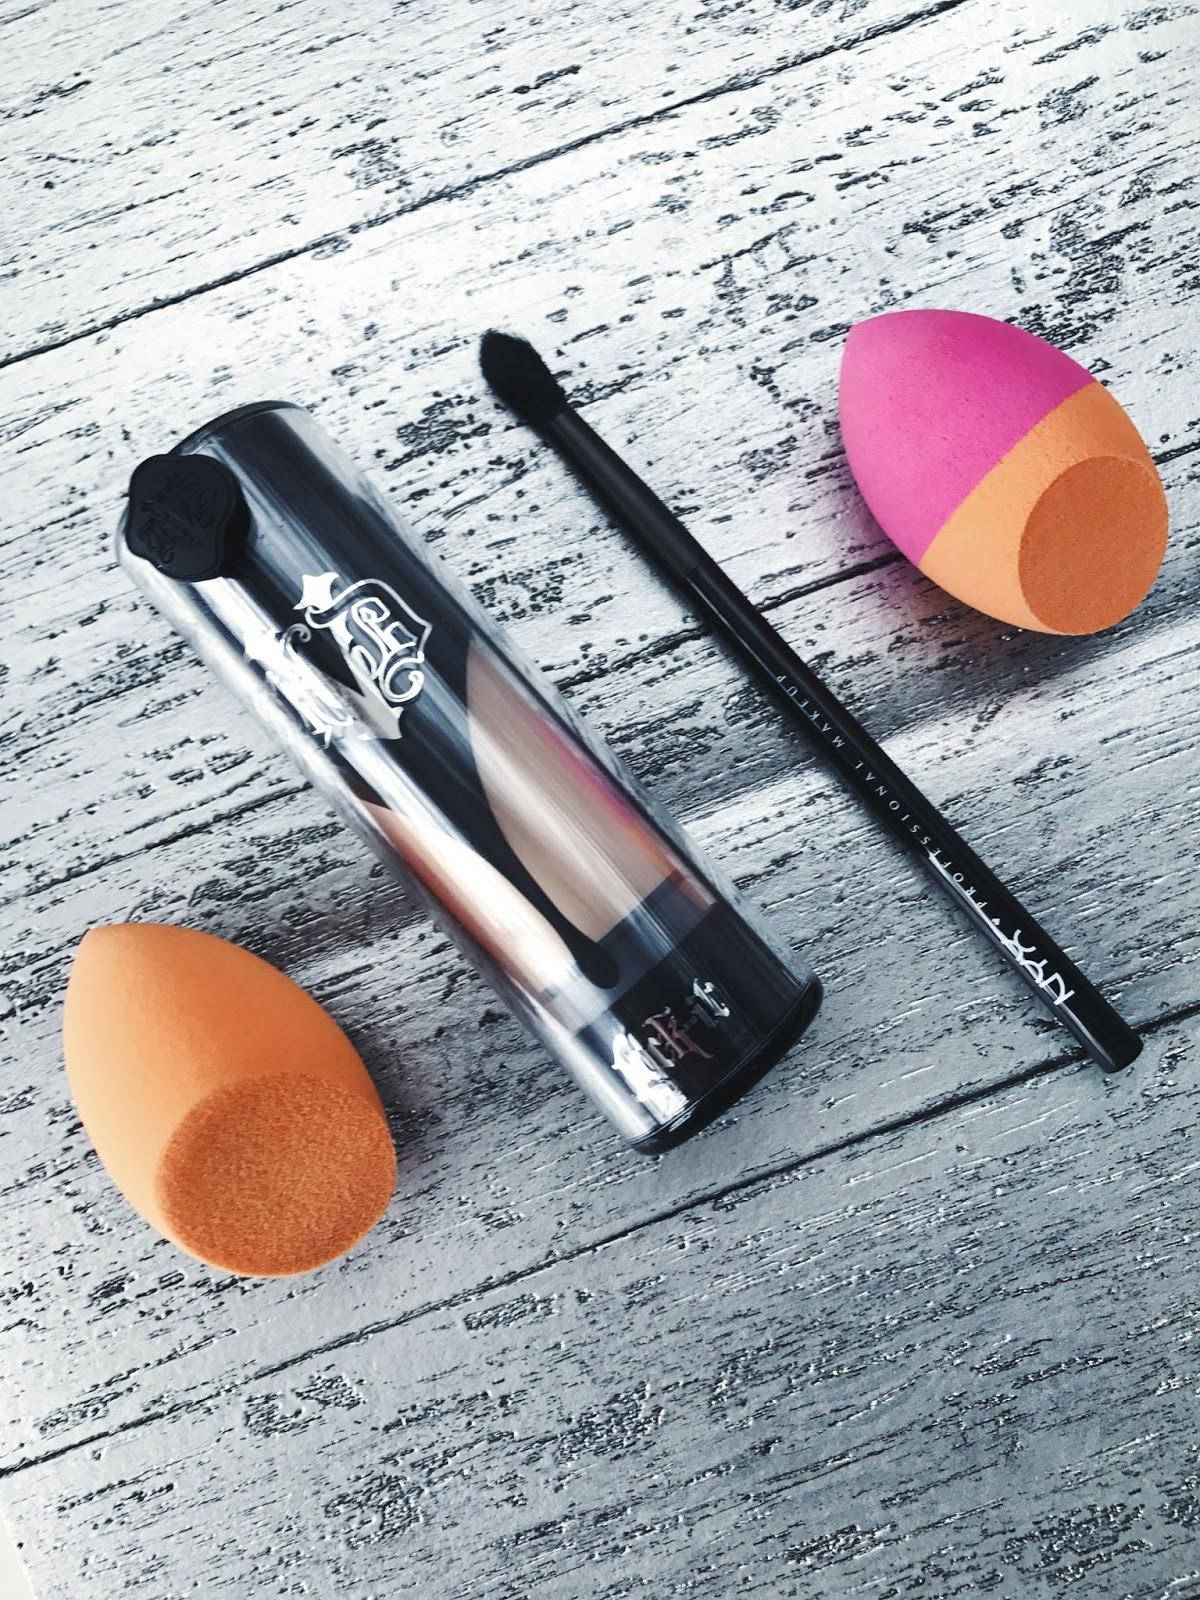 Kat Von D Lock-it foundation and beauty blender